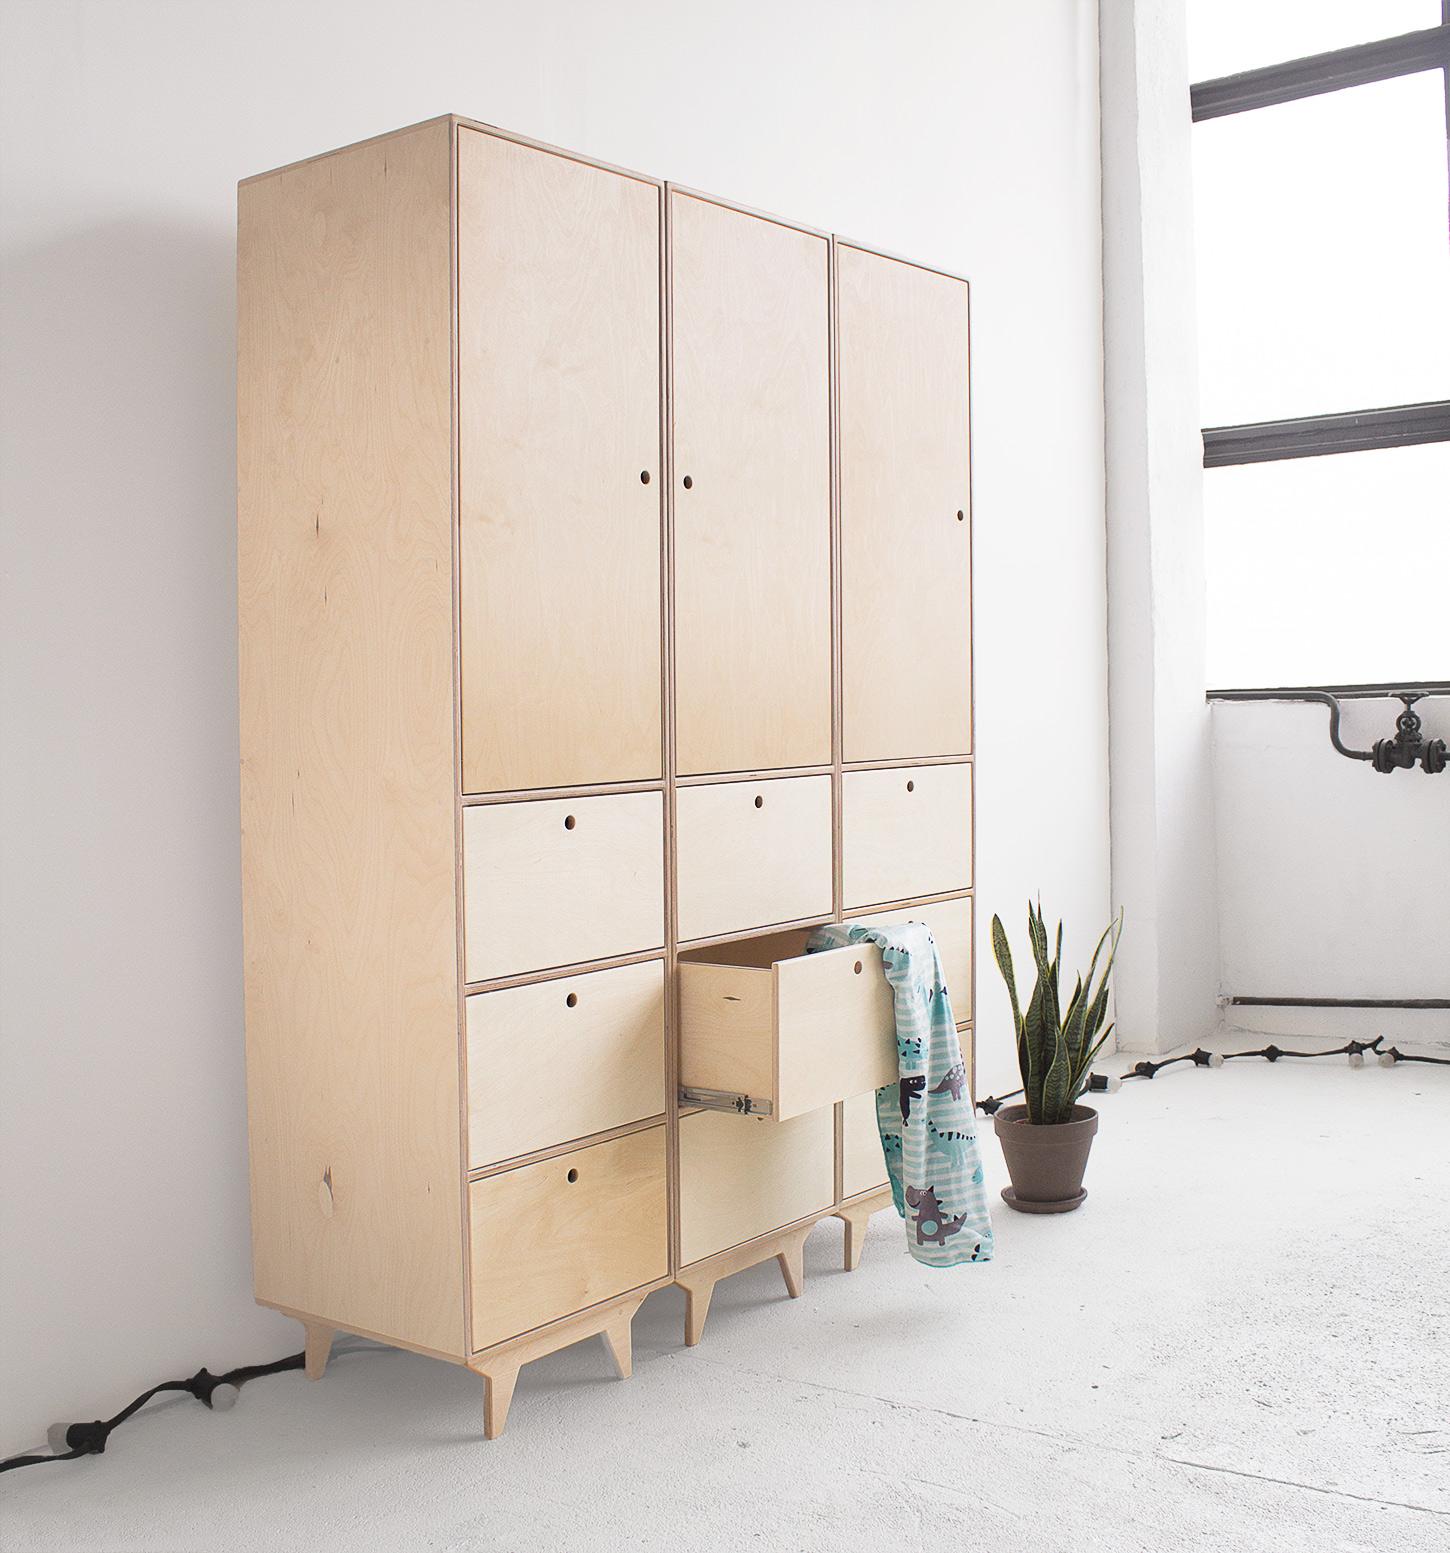 plywood wardrobe spacious drawers handmade custom